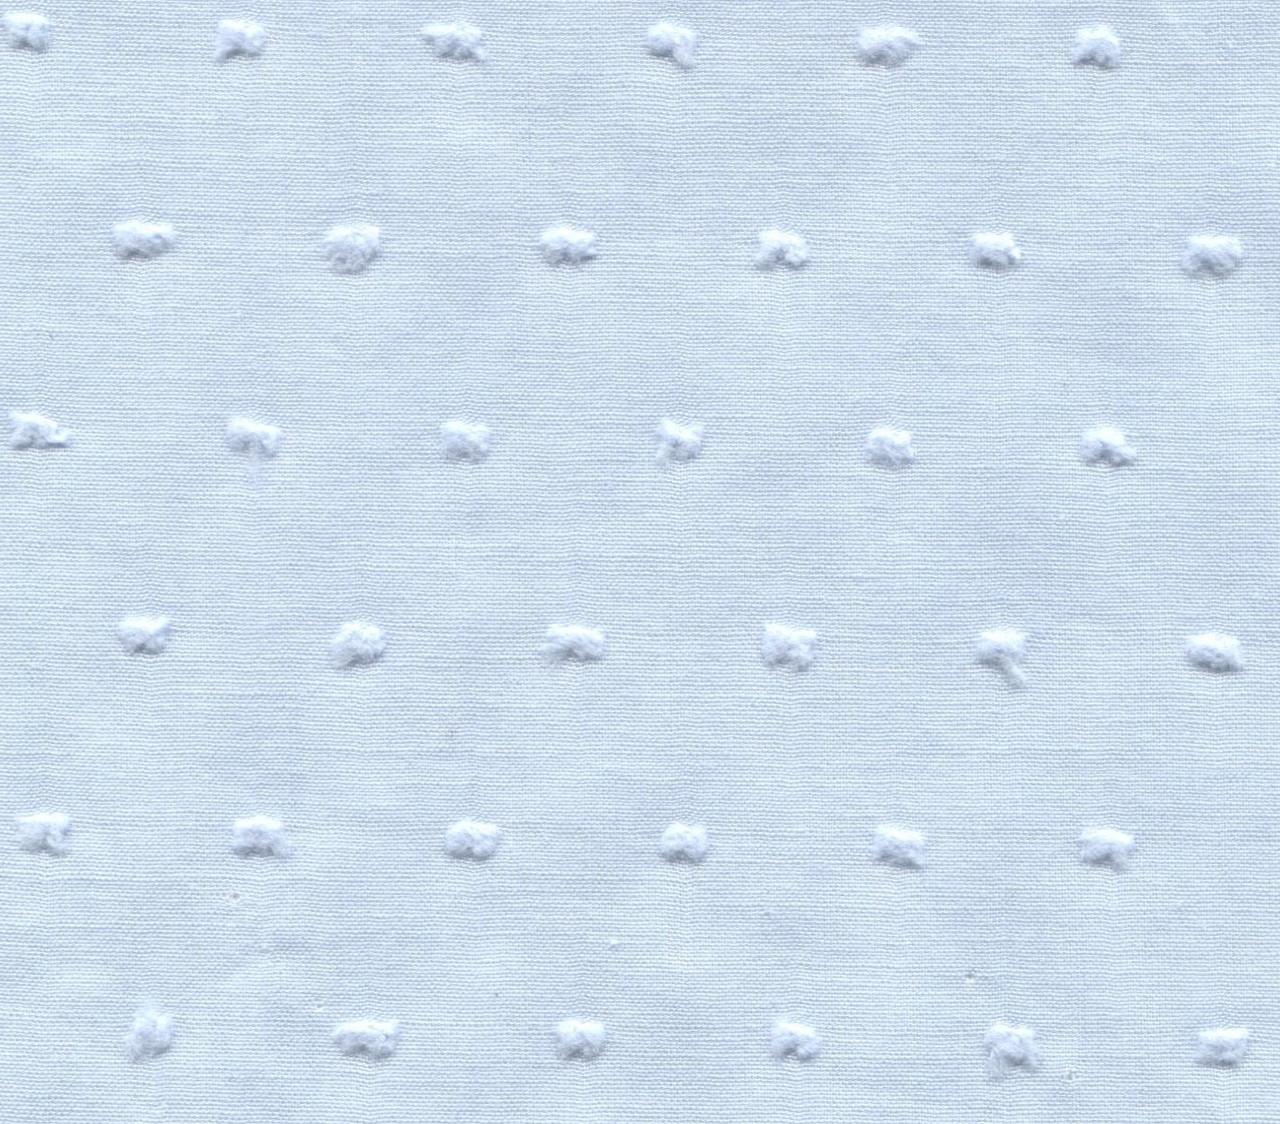 Blue Cut Spot 100% Cotton fabric by the metre